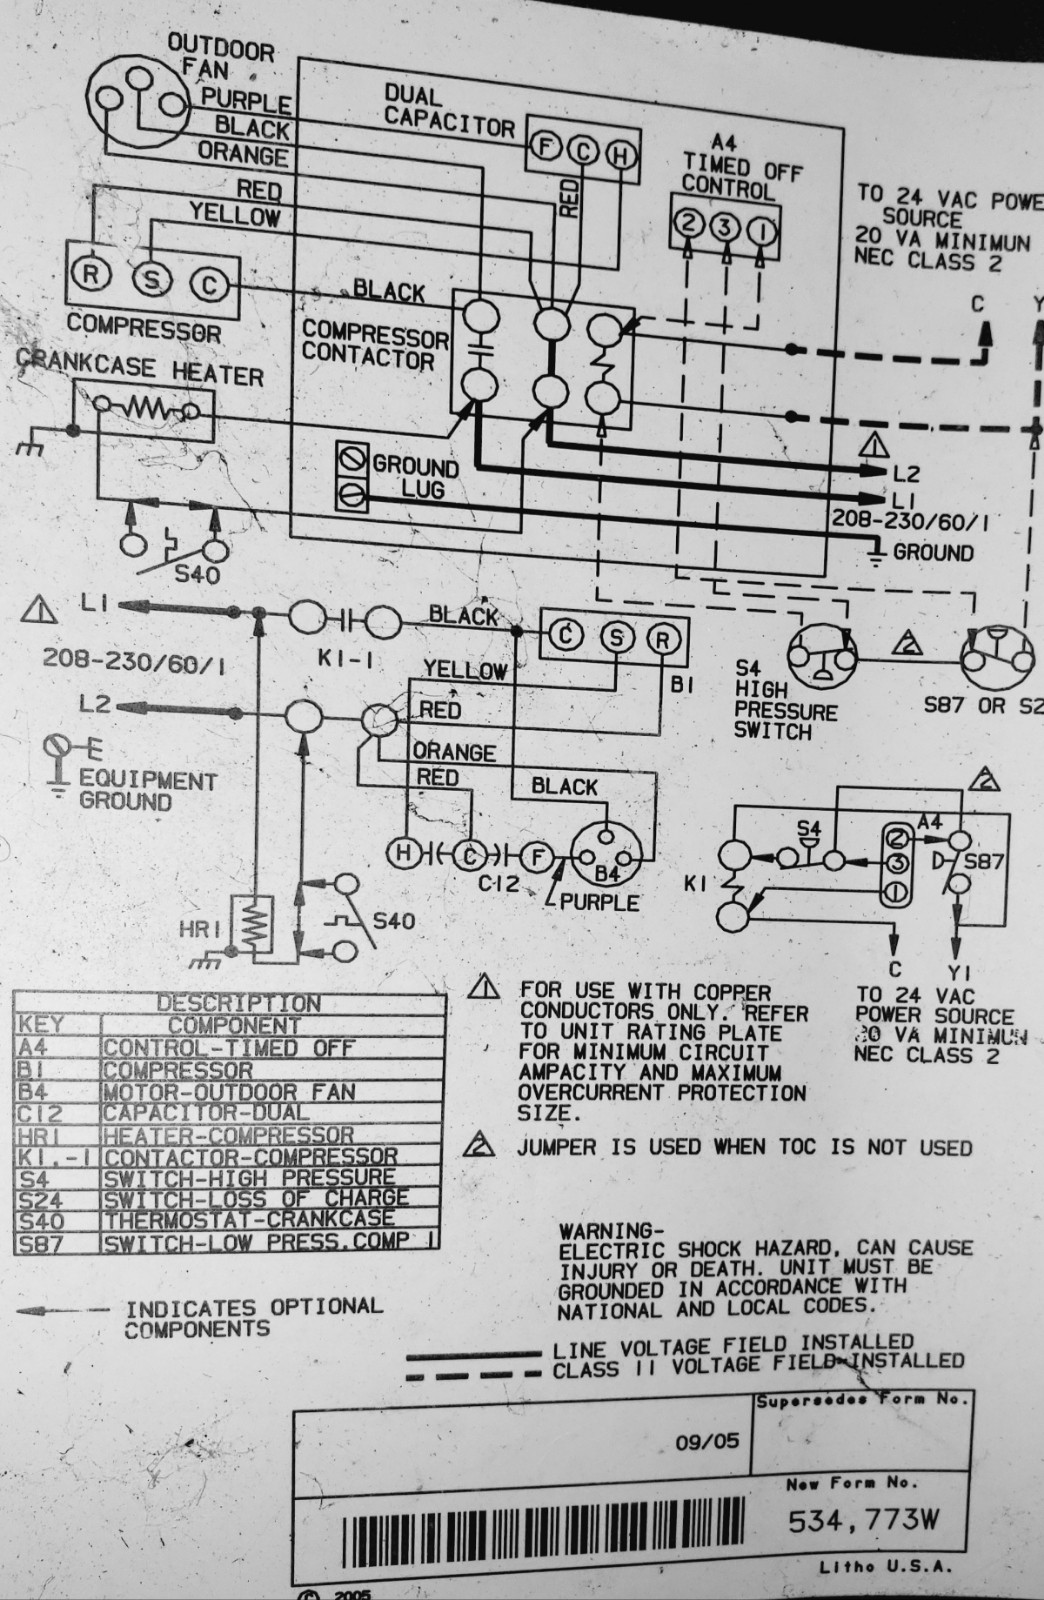 Air Conditioner Wiring Diagram Wiring Diagram